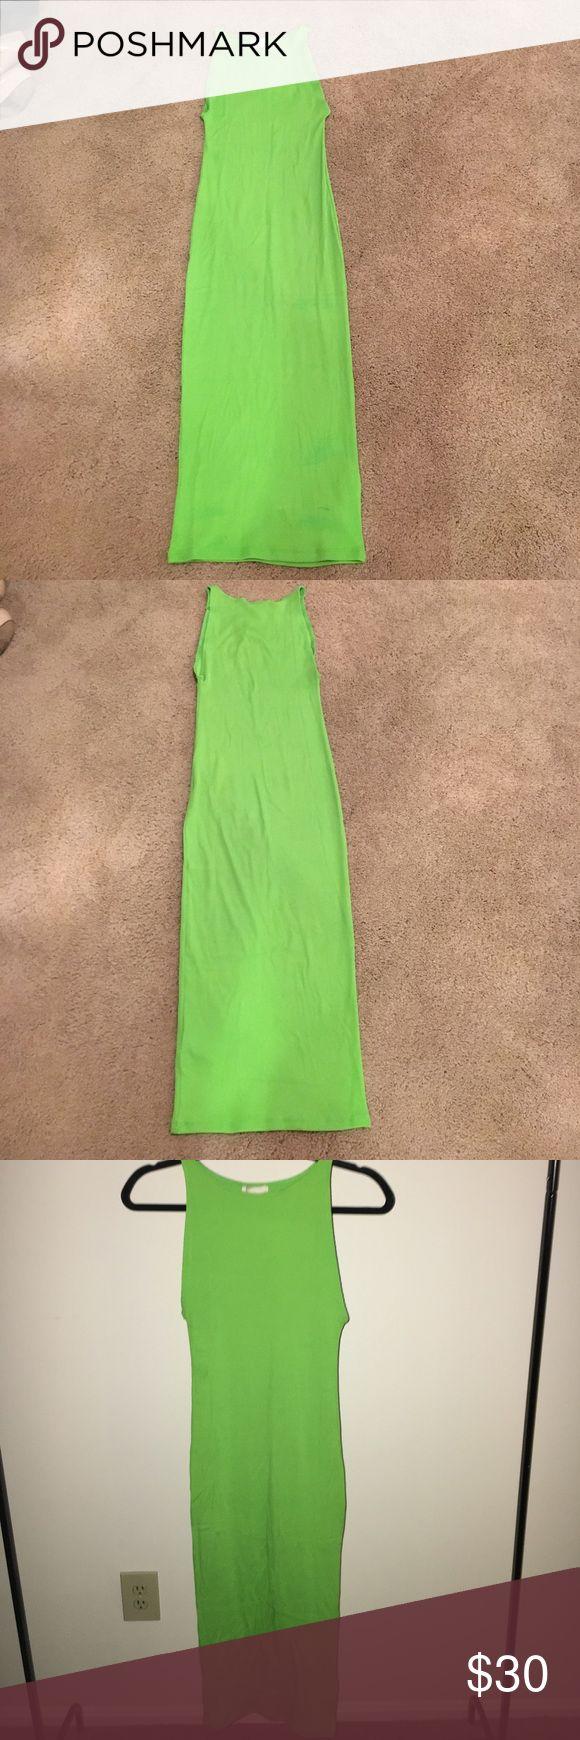 Lime Green Dress Midi- Length Dress• Ribbed• Lime Green• Great for upcoming Spring/Summer Season• Brand New• H&M Dresses Midi